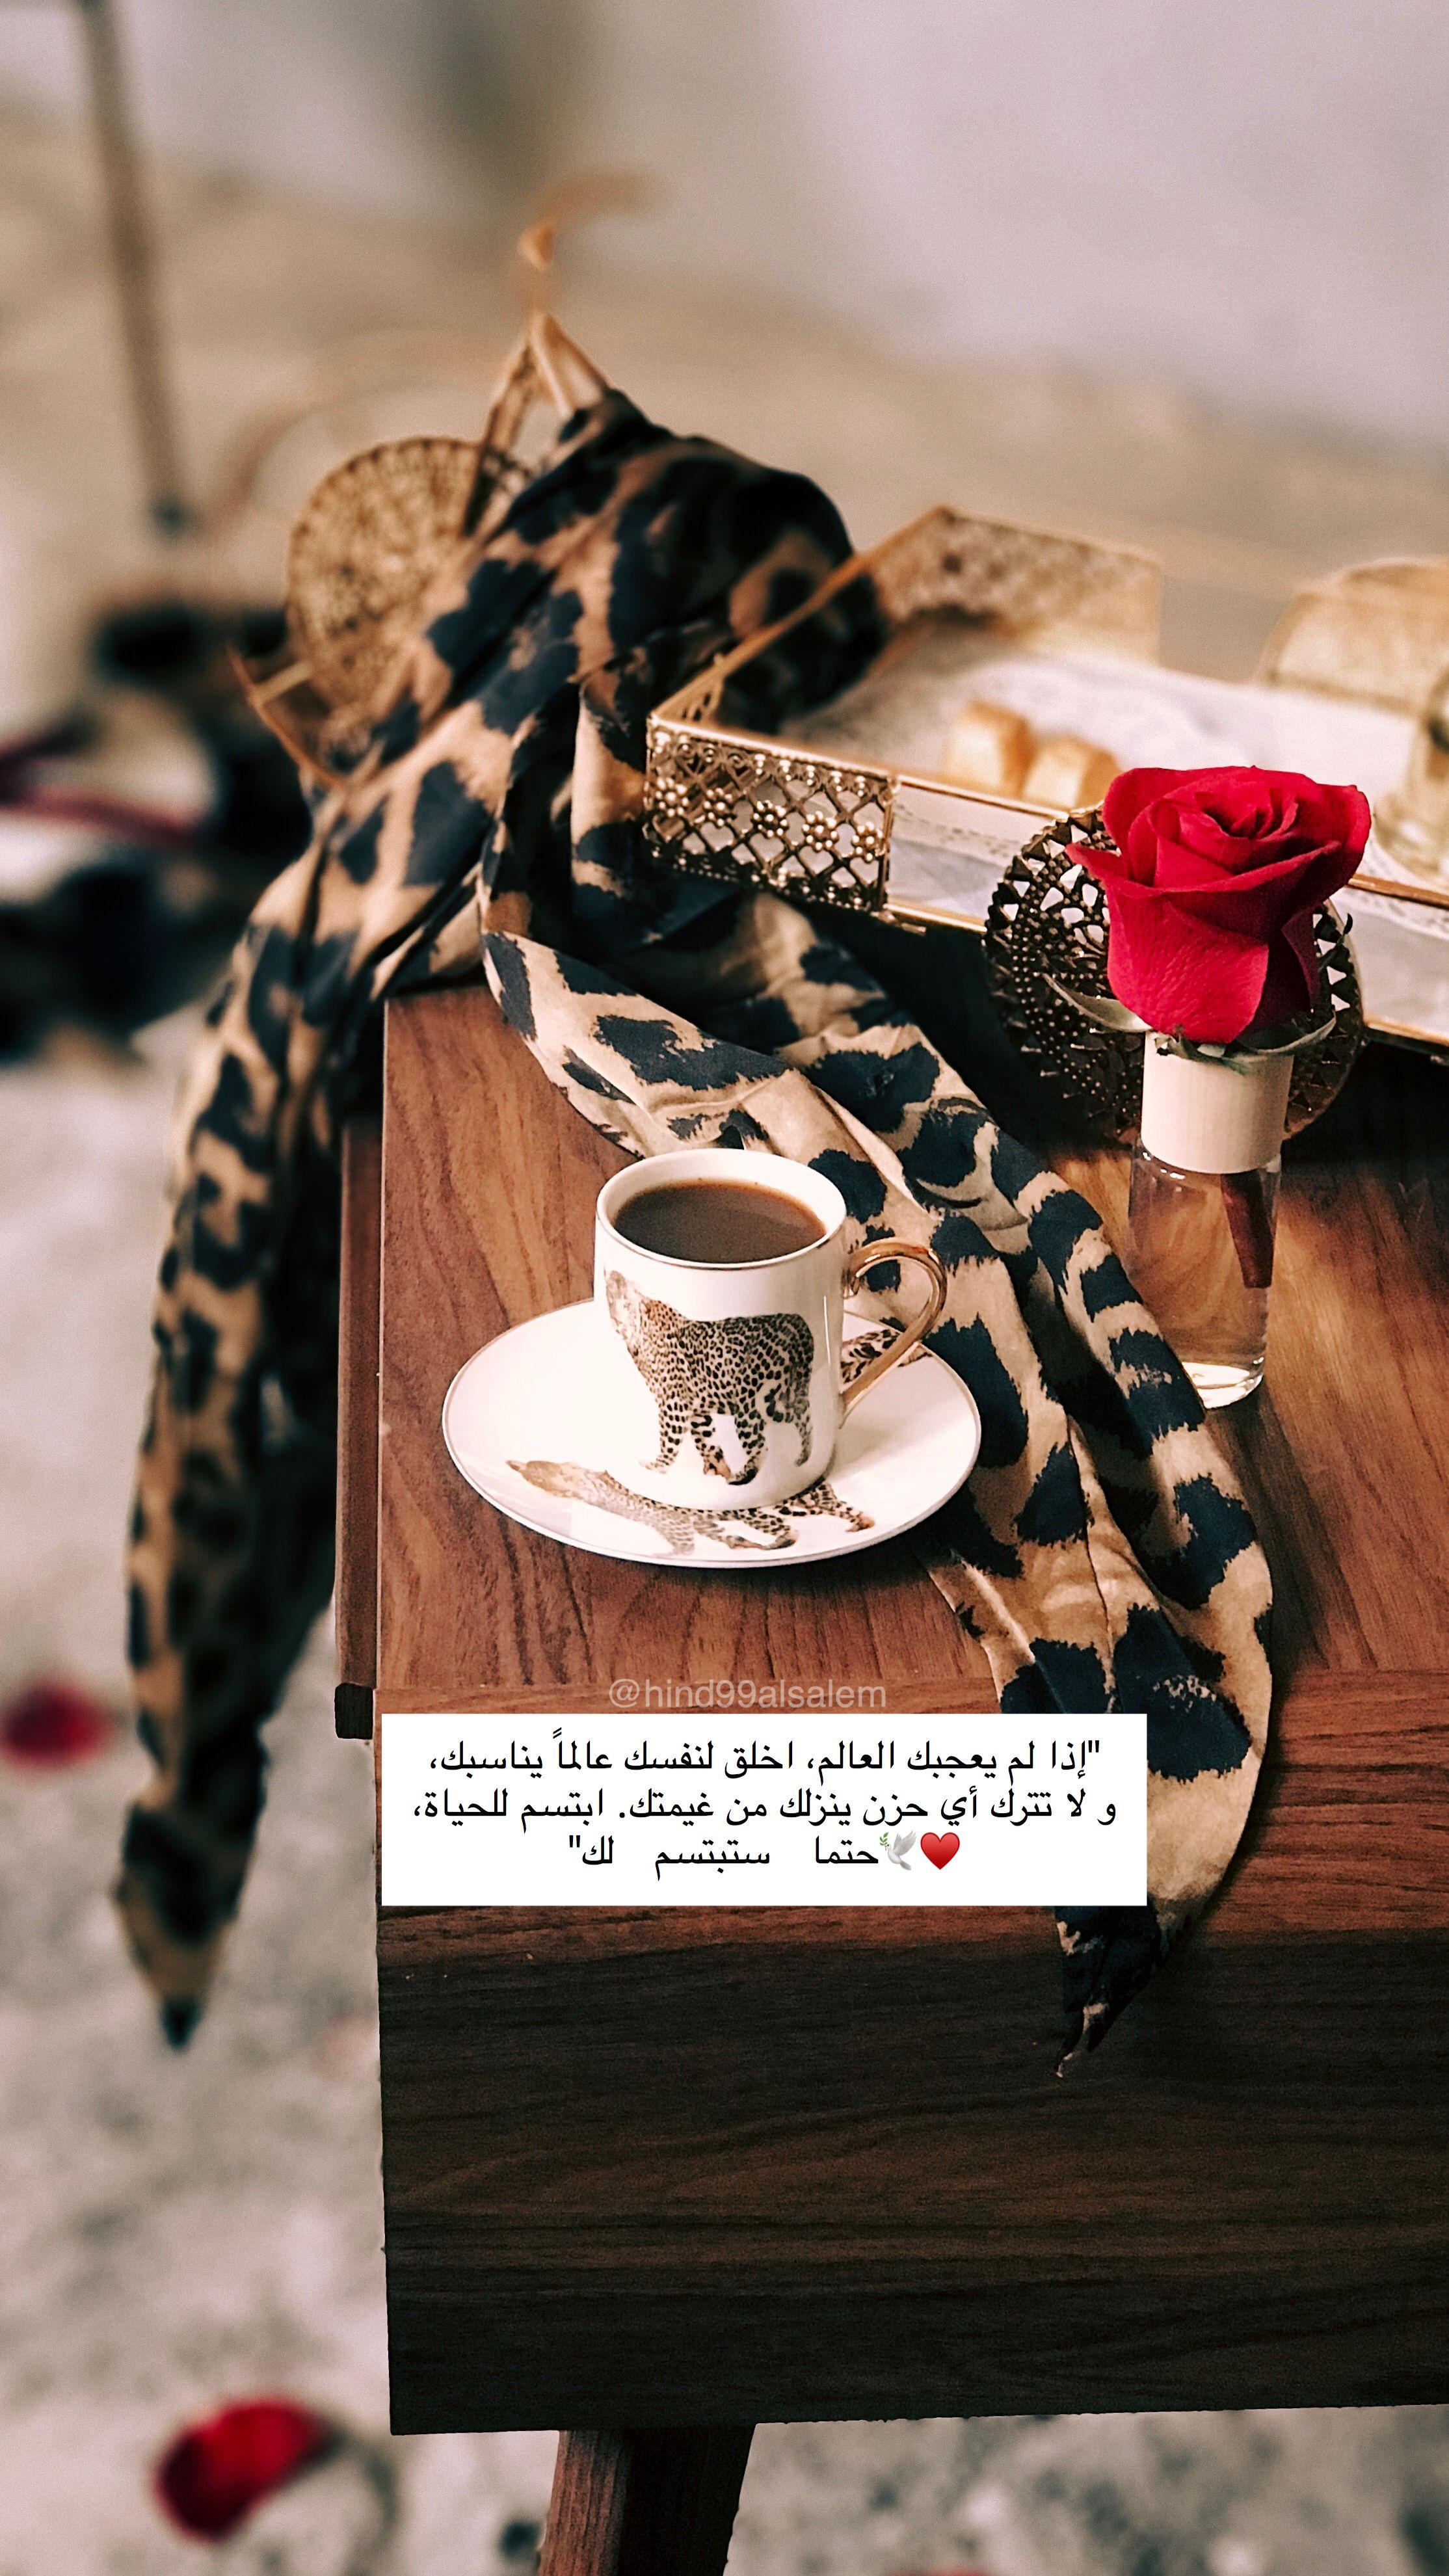 دعاء صورة افكار احترافيه Coffee Coffeetime قهوه كوفي تكوين عدسه سناب Pictures كلام كلمات حب عشق Photo Ideas Girl Lovers Pics Beautiful Quotes